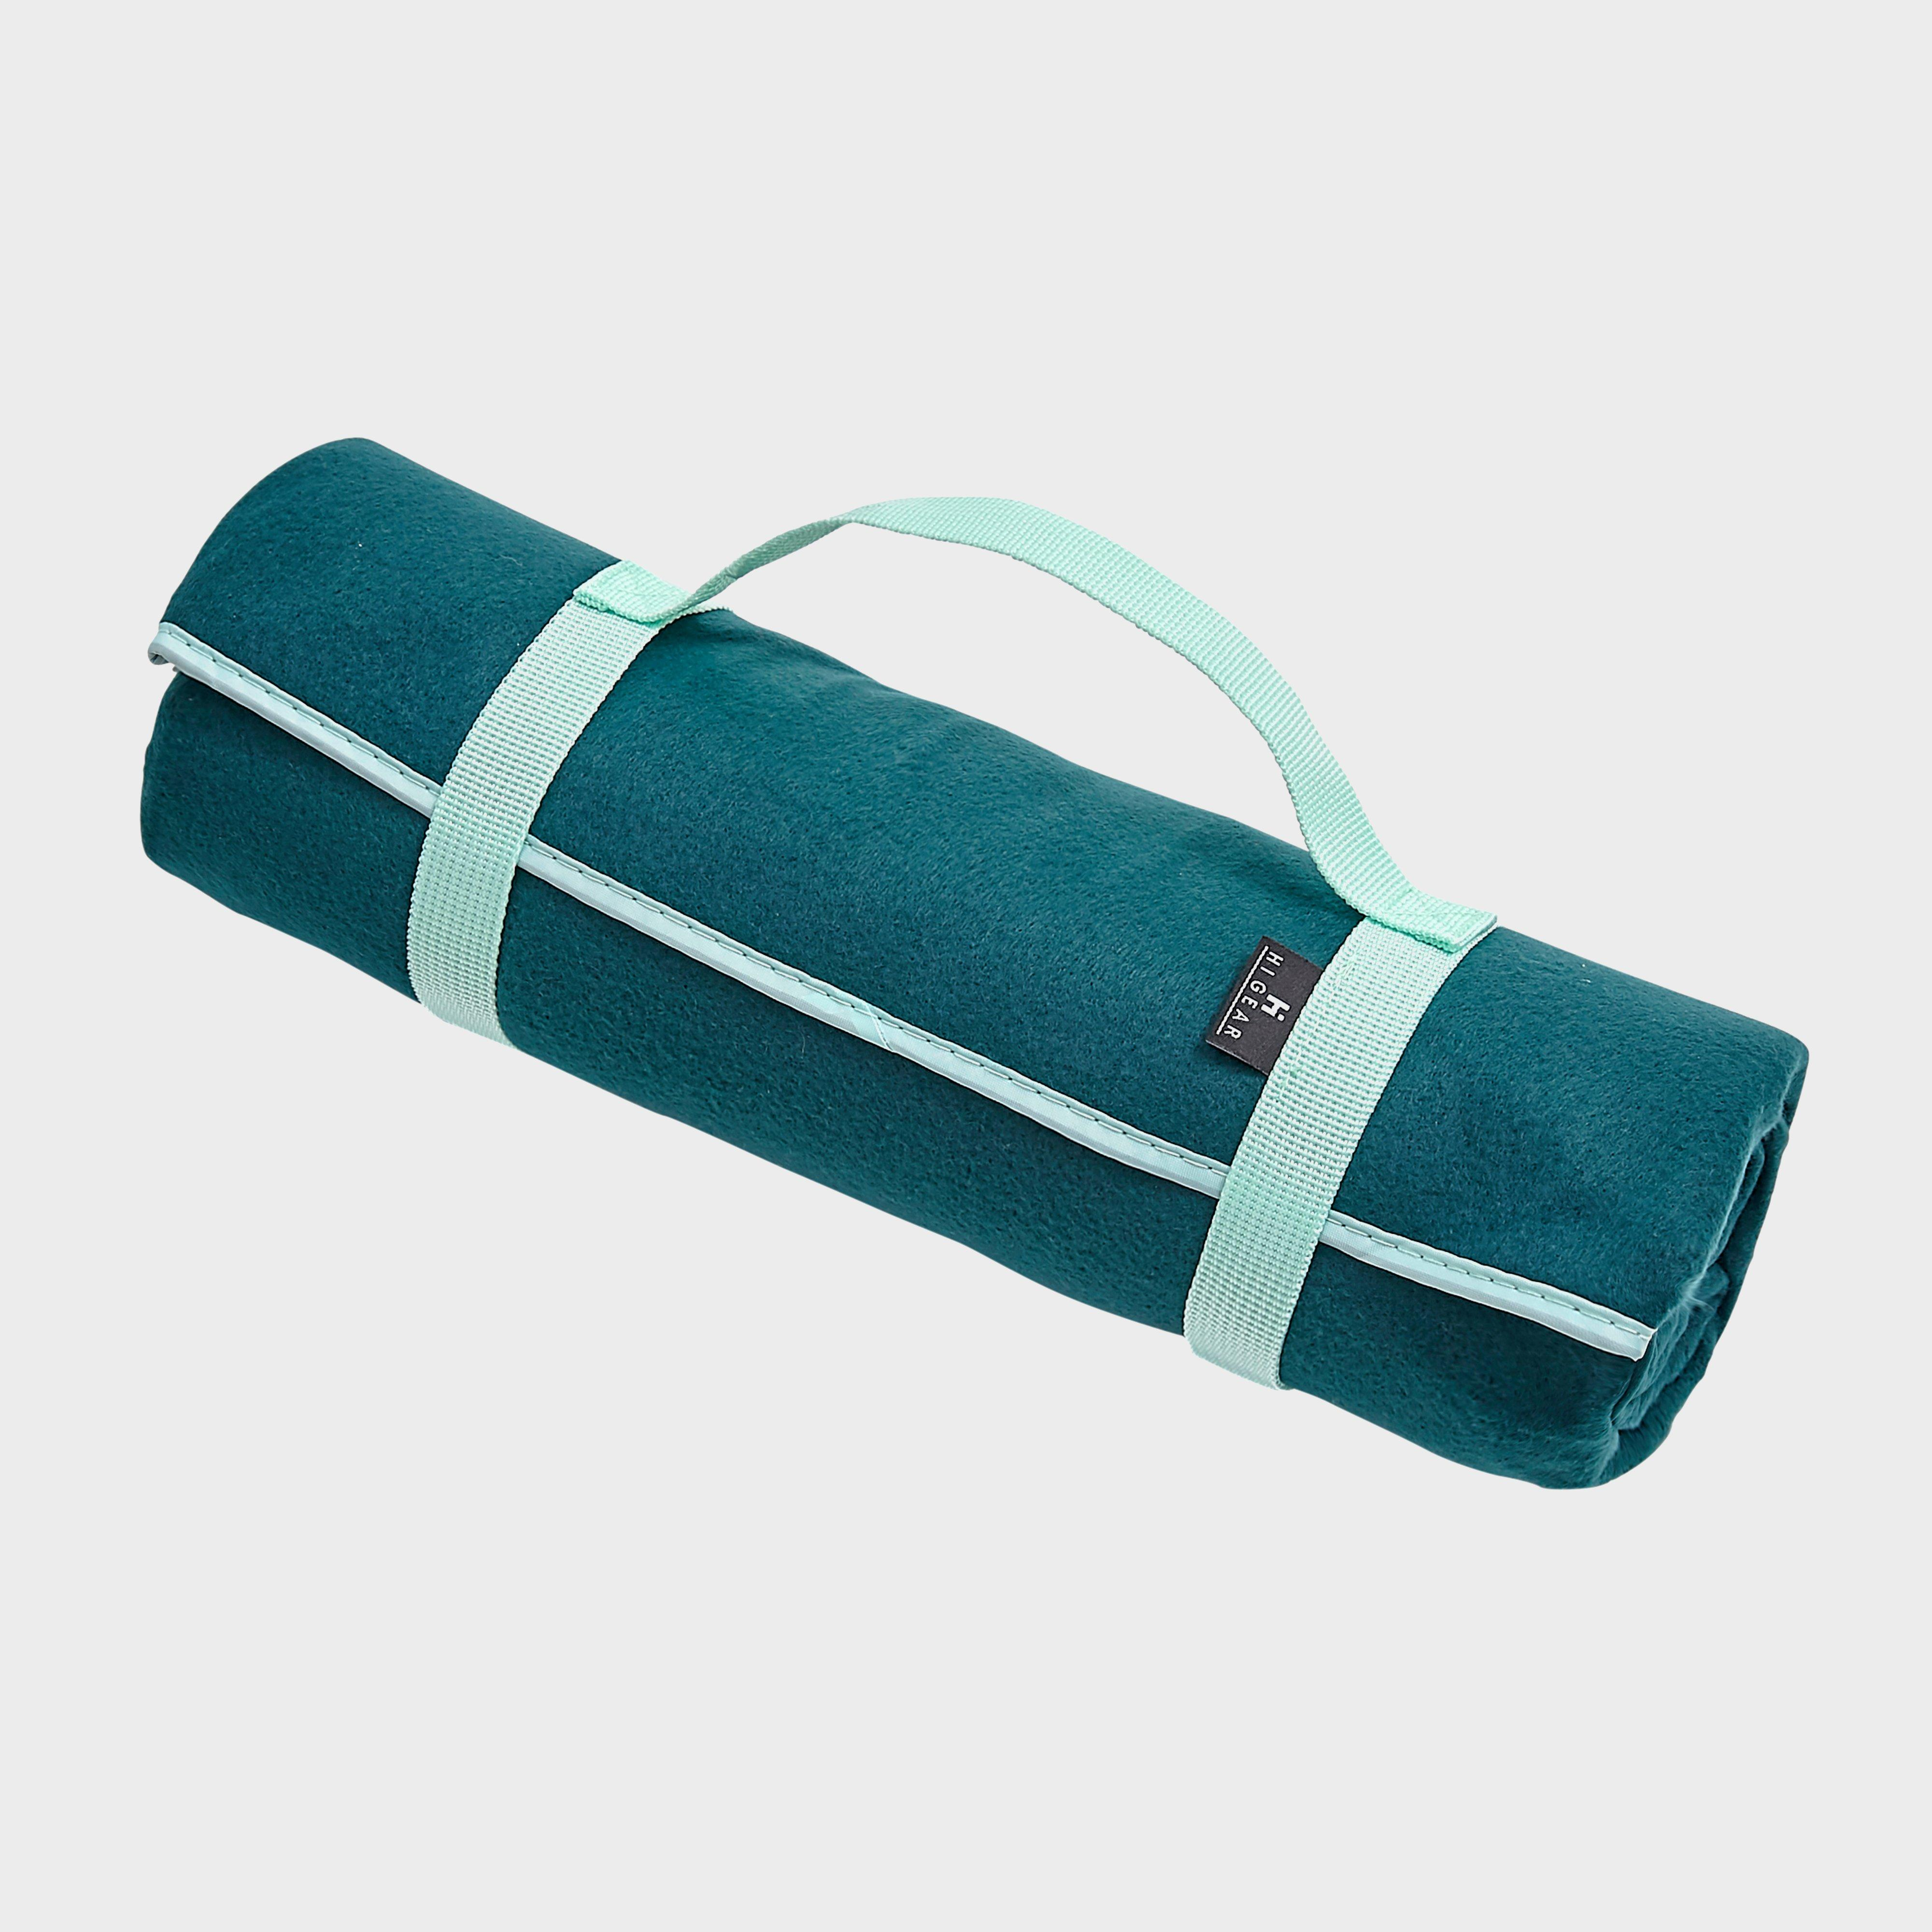 Eurohike Eh Picnic Blanket - Blue/tea  Blue/tea